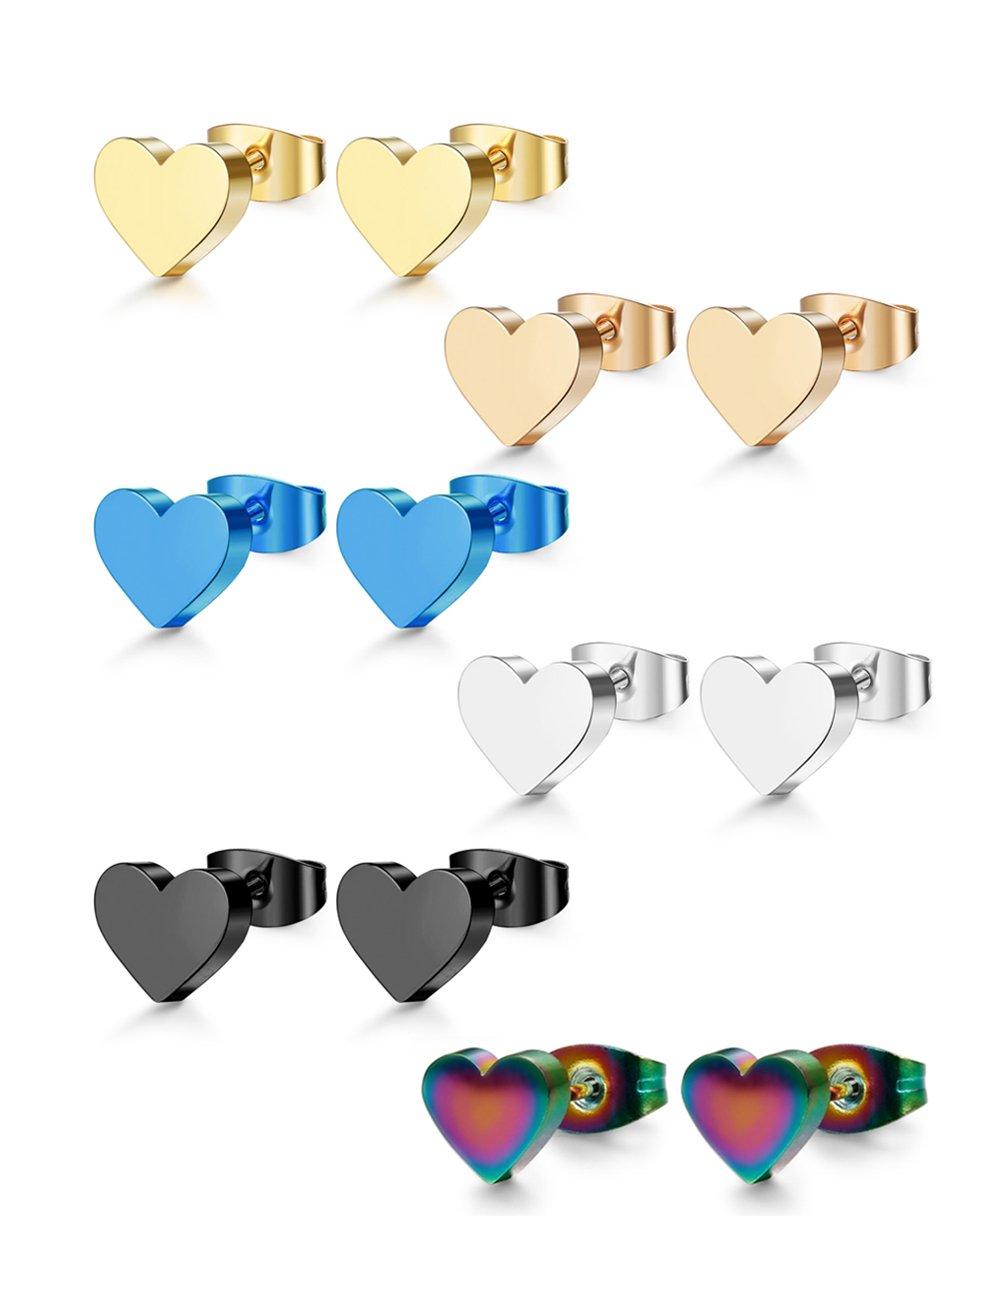 ORAZIO 6 Pair Stainless Steel Heart Stud Earrings for Women Men